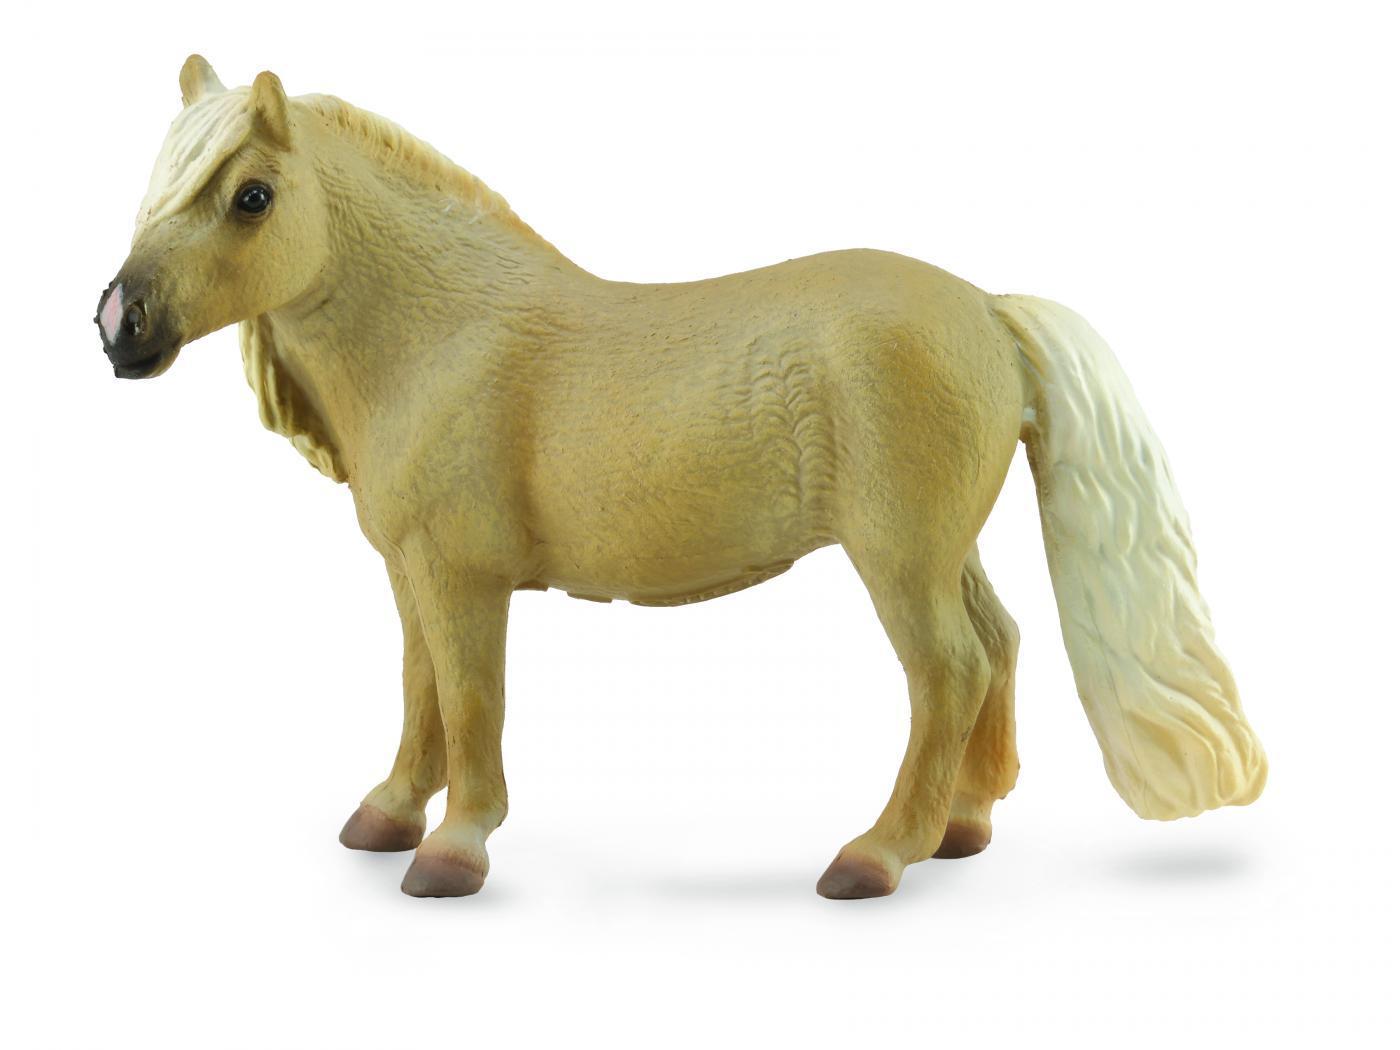 Playmobil Cheval /& femelle Rider//Jockey for farm//Stable//animaux